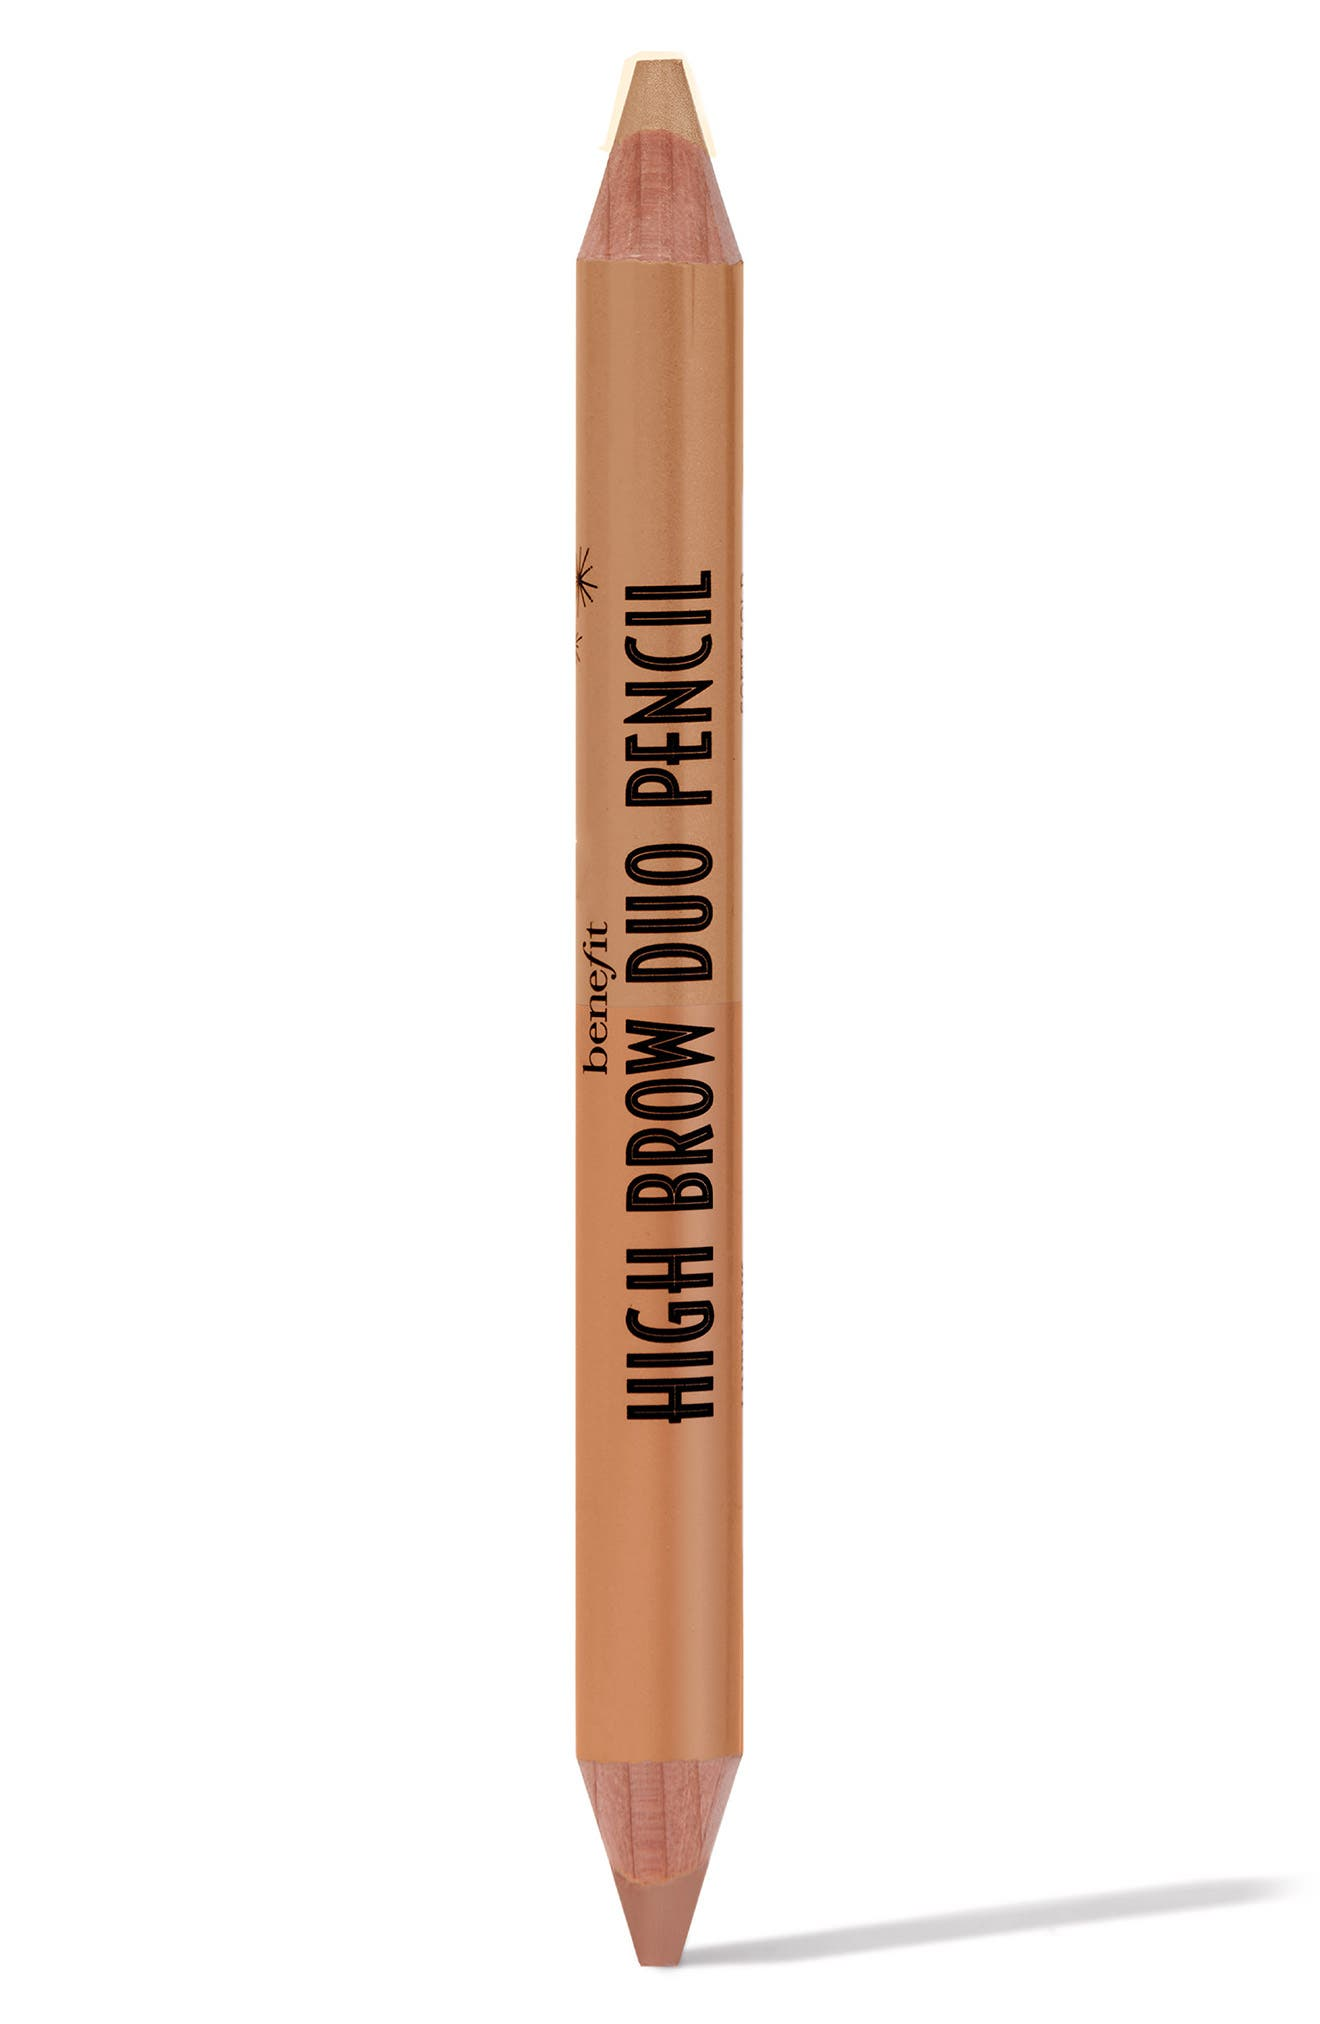 Benefit High Brow Duo Pencil Eyebrow Highlighting Pencil